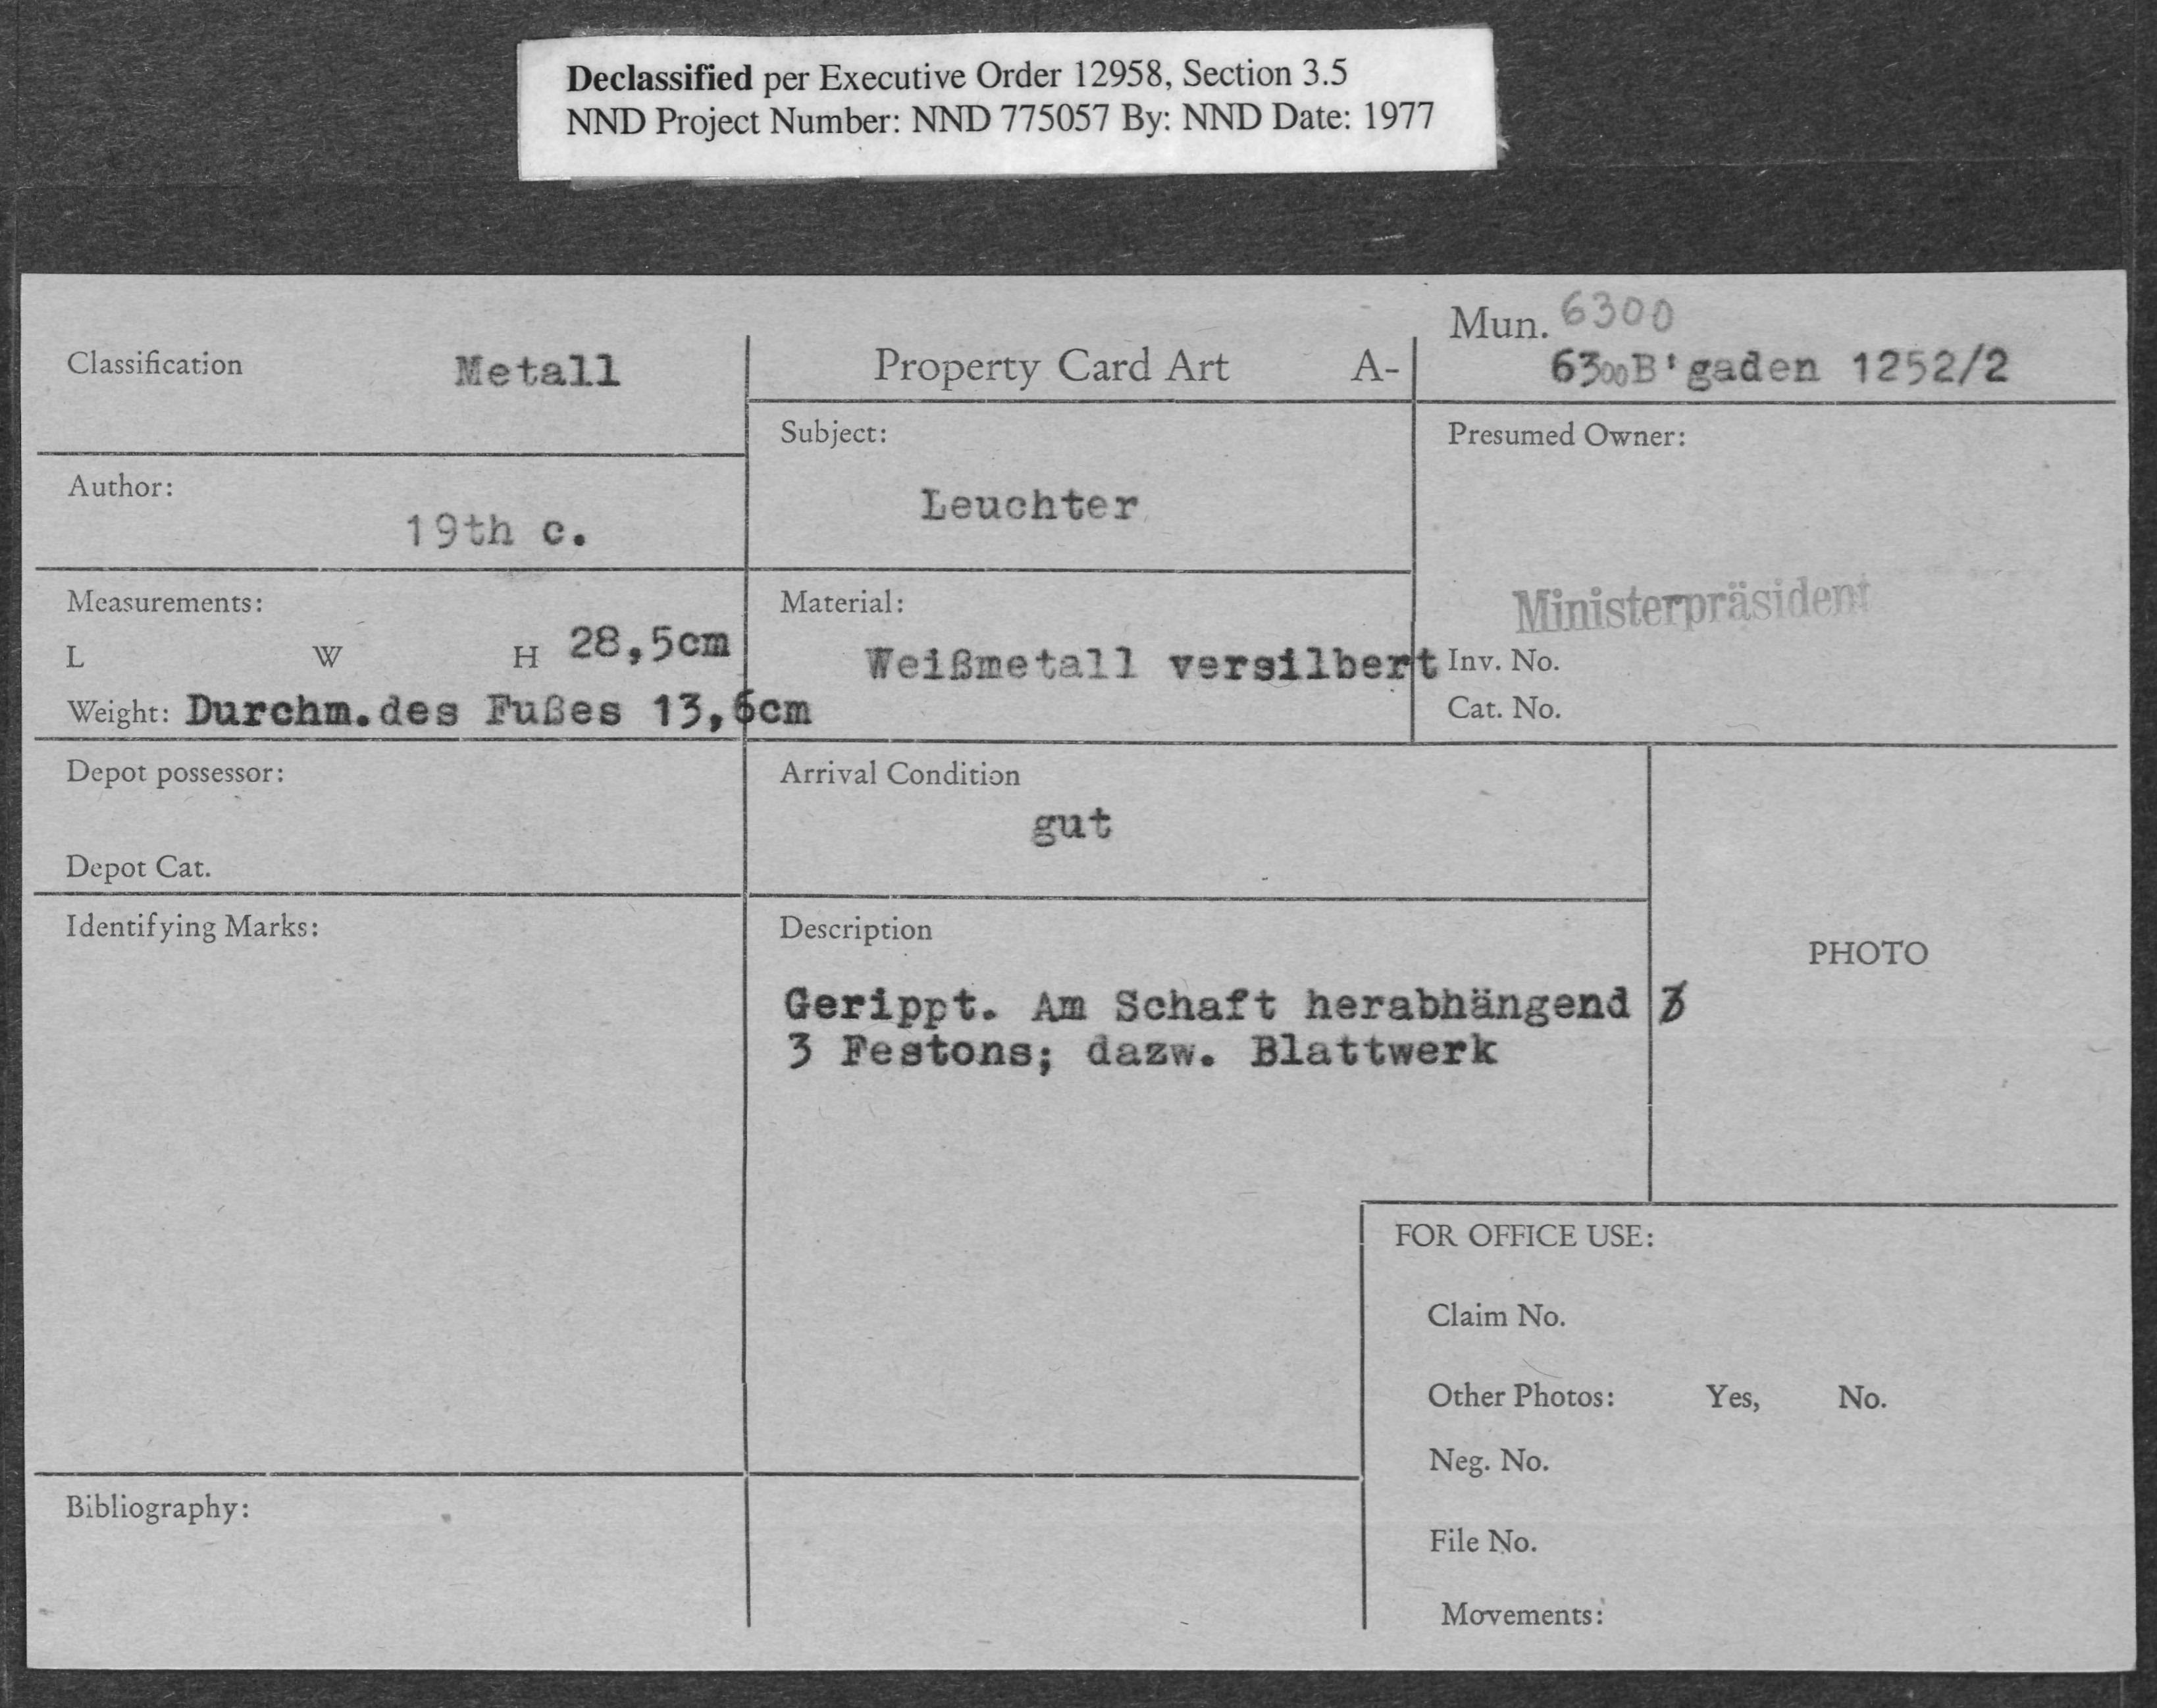 Metall: Leuchter, Property Card Number 6300 B'gaden 1252/2